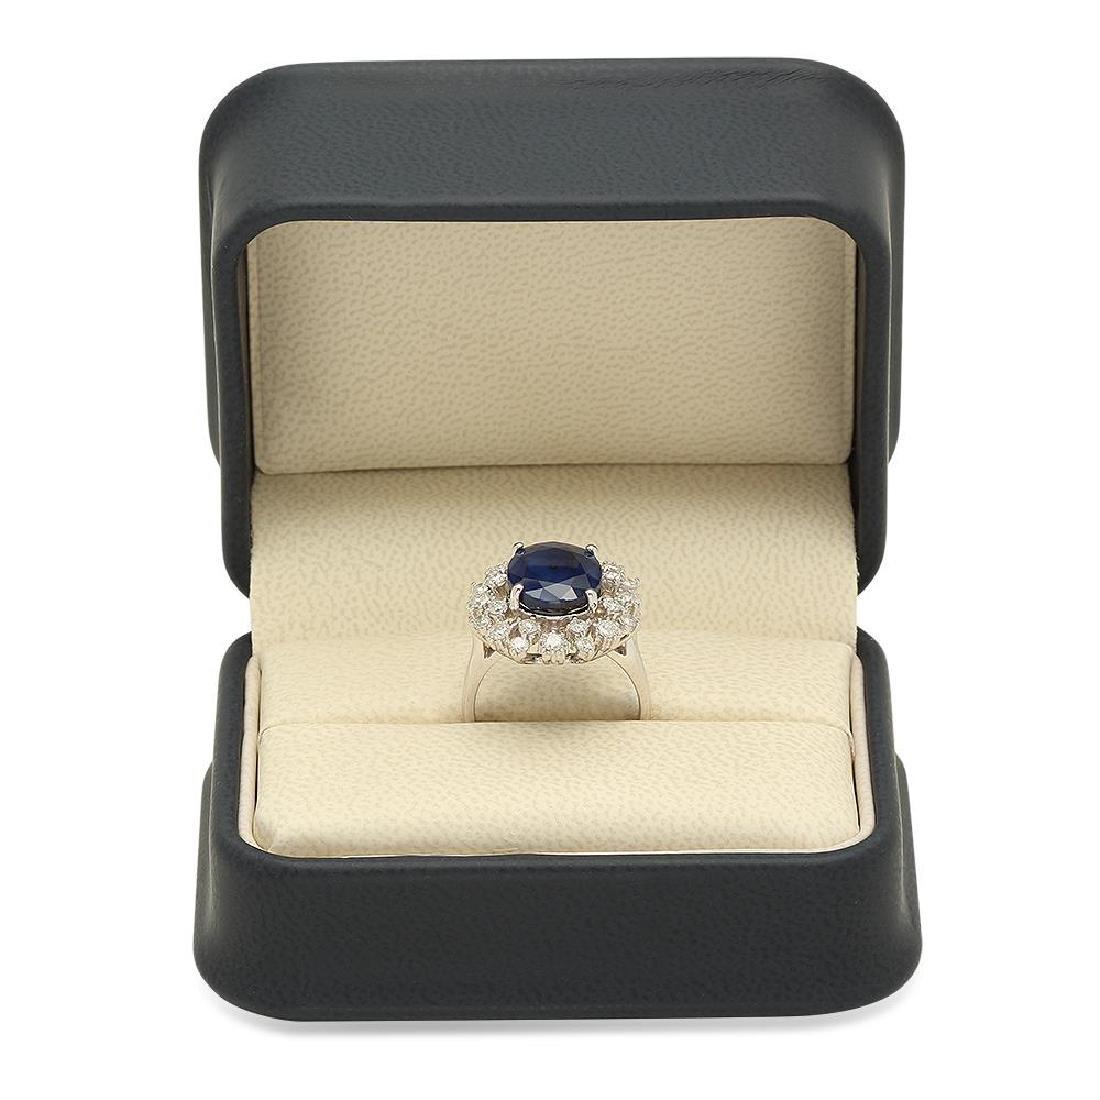 14K Gold 6.16ct Sapphire 1.00cts Diamond Ring - 4